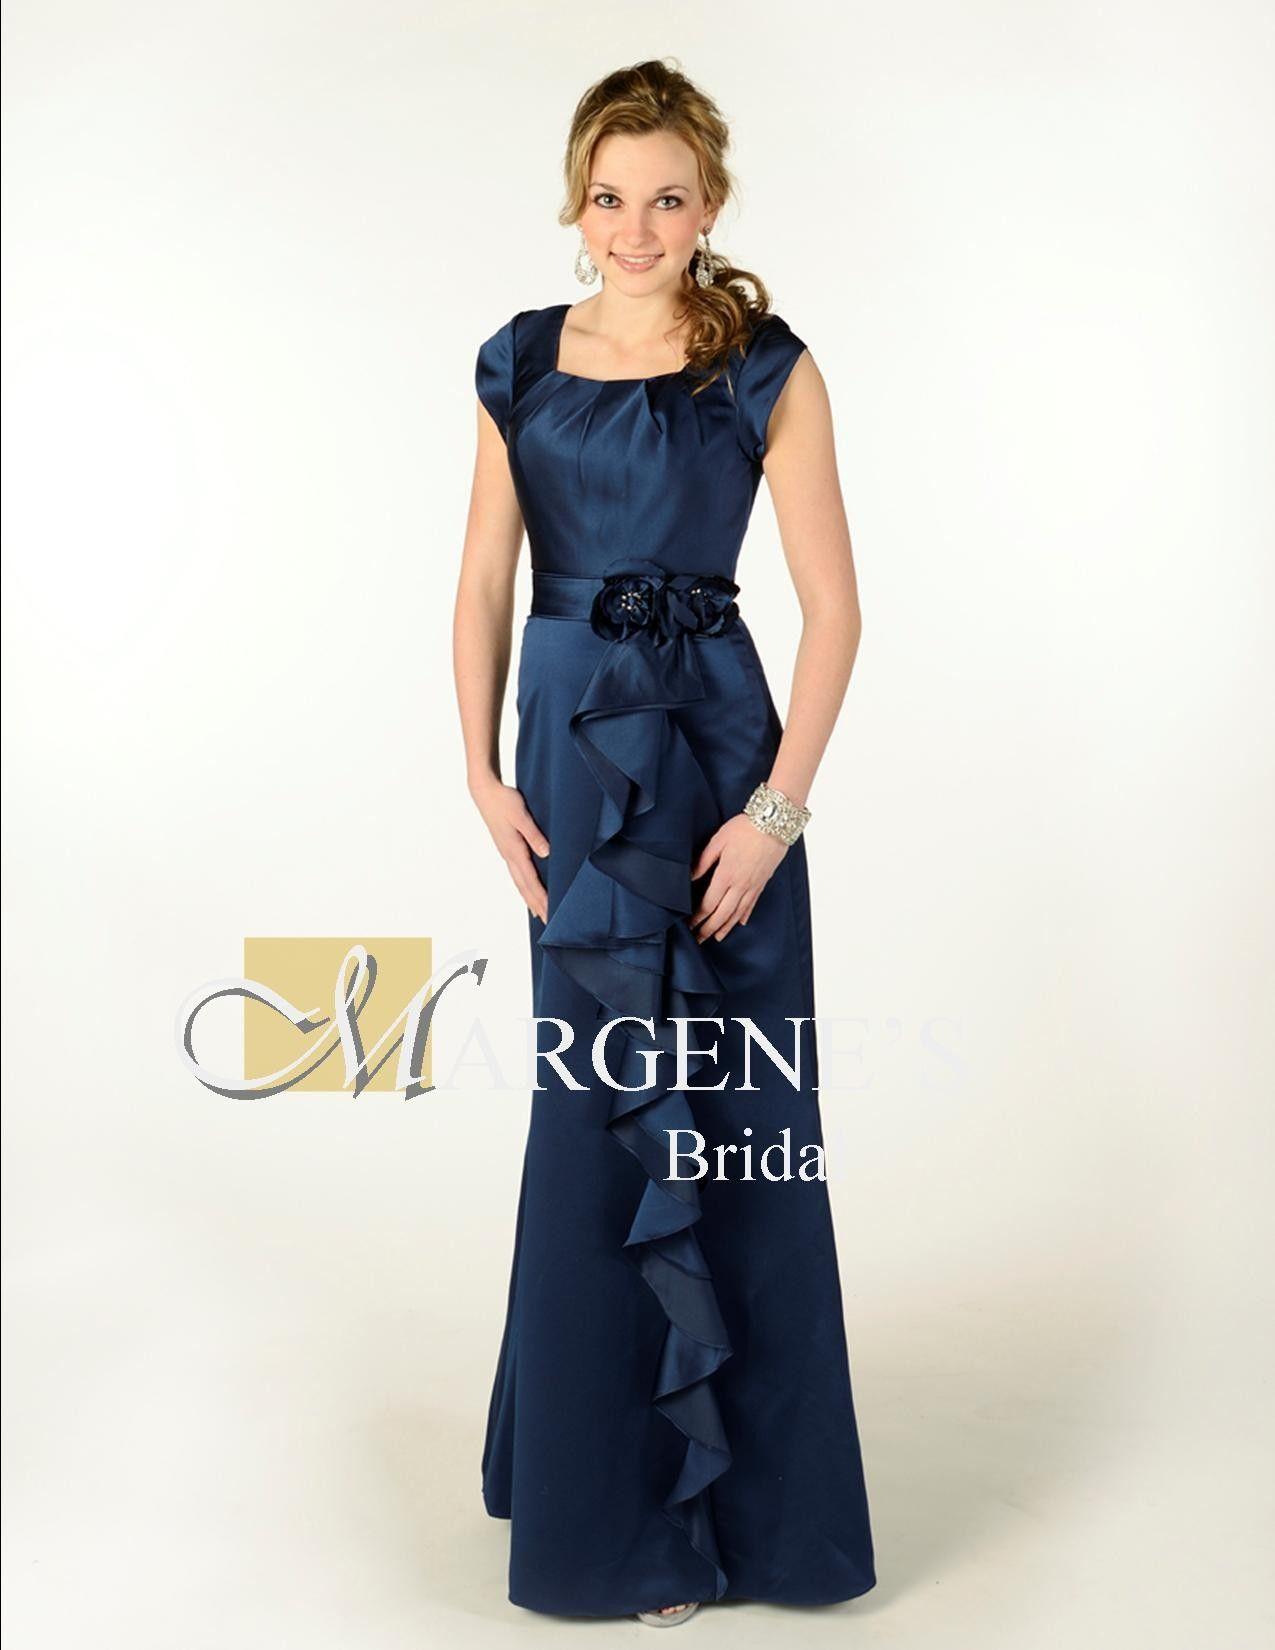 Flora Modest Prom Dress Margene S Bridal Modest Dresses Prom Dresses Modest Modest Formal Dresses [ 1650 x 1275 Pixel ]